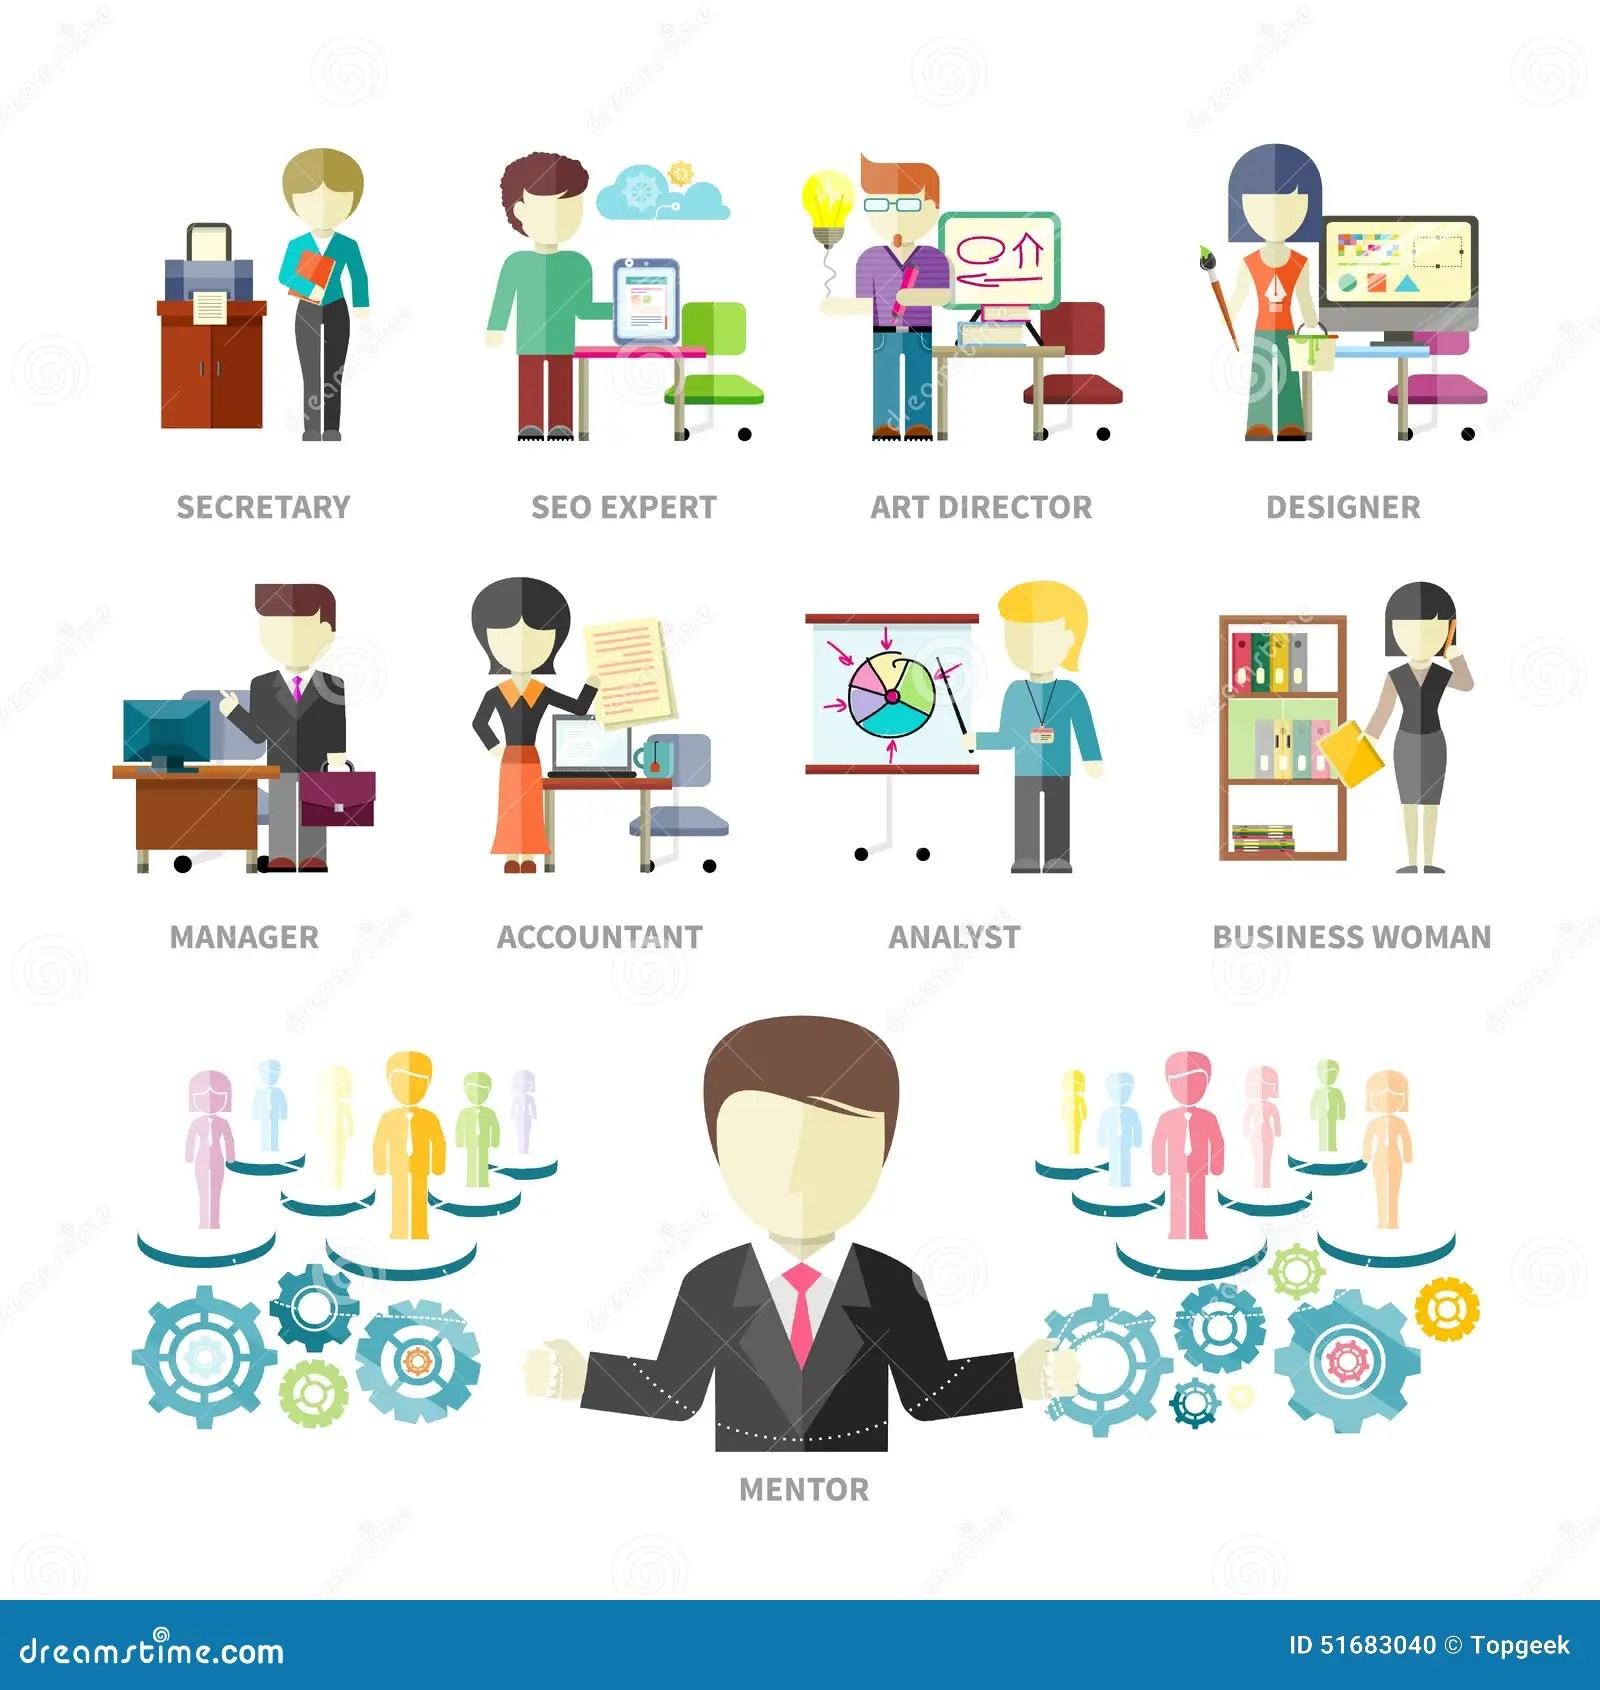 Mentoring Career Development Style